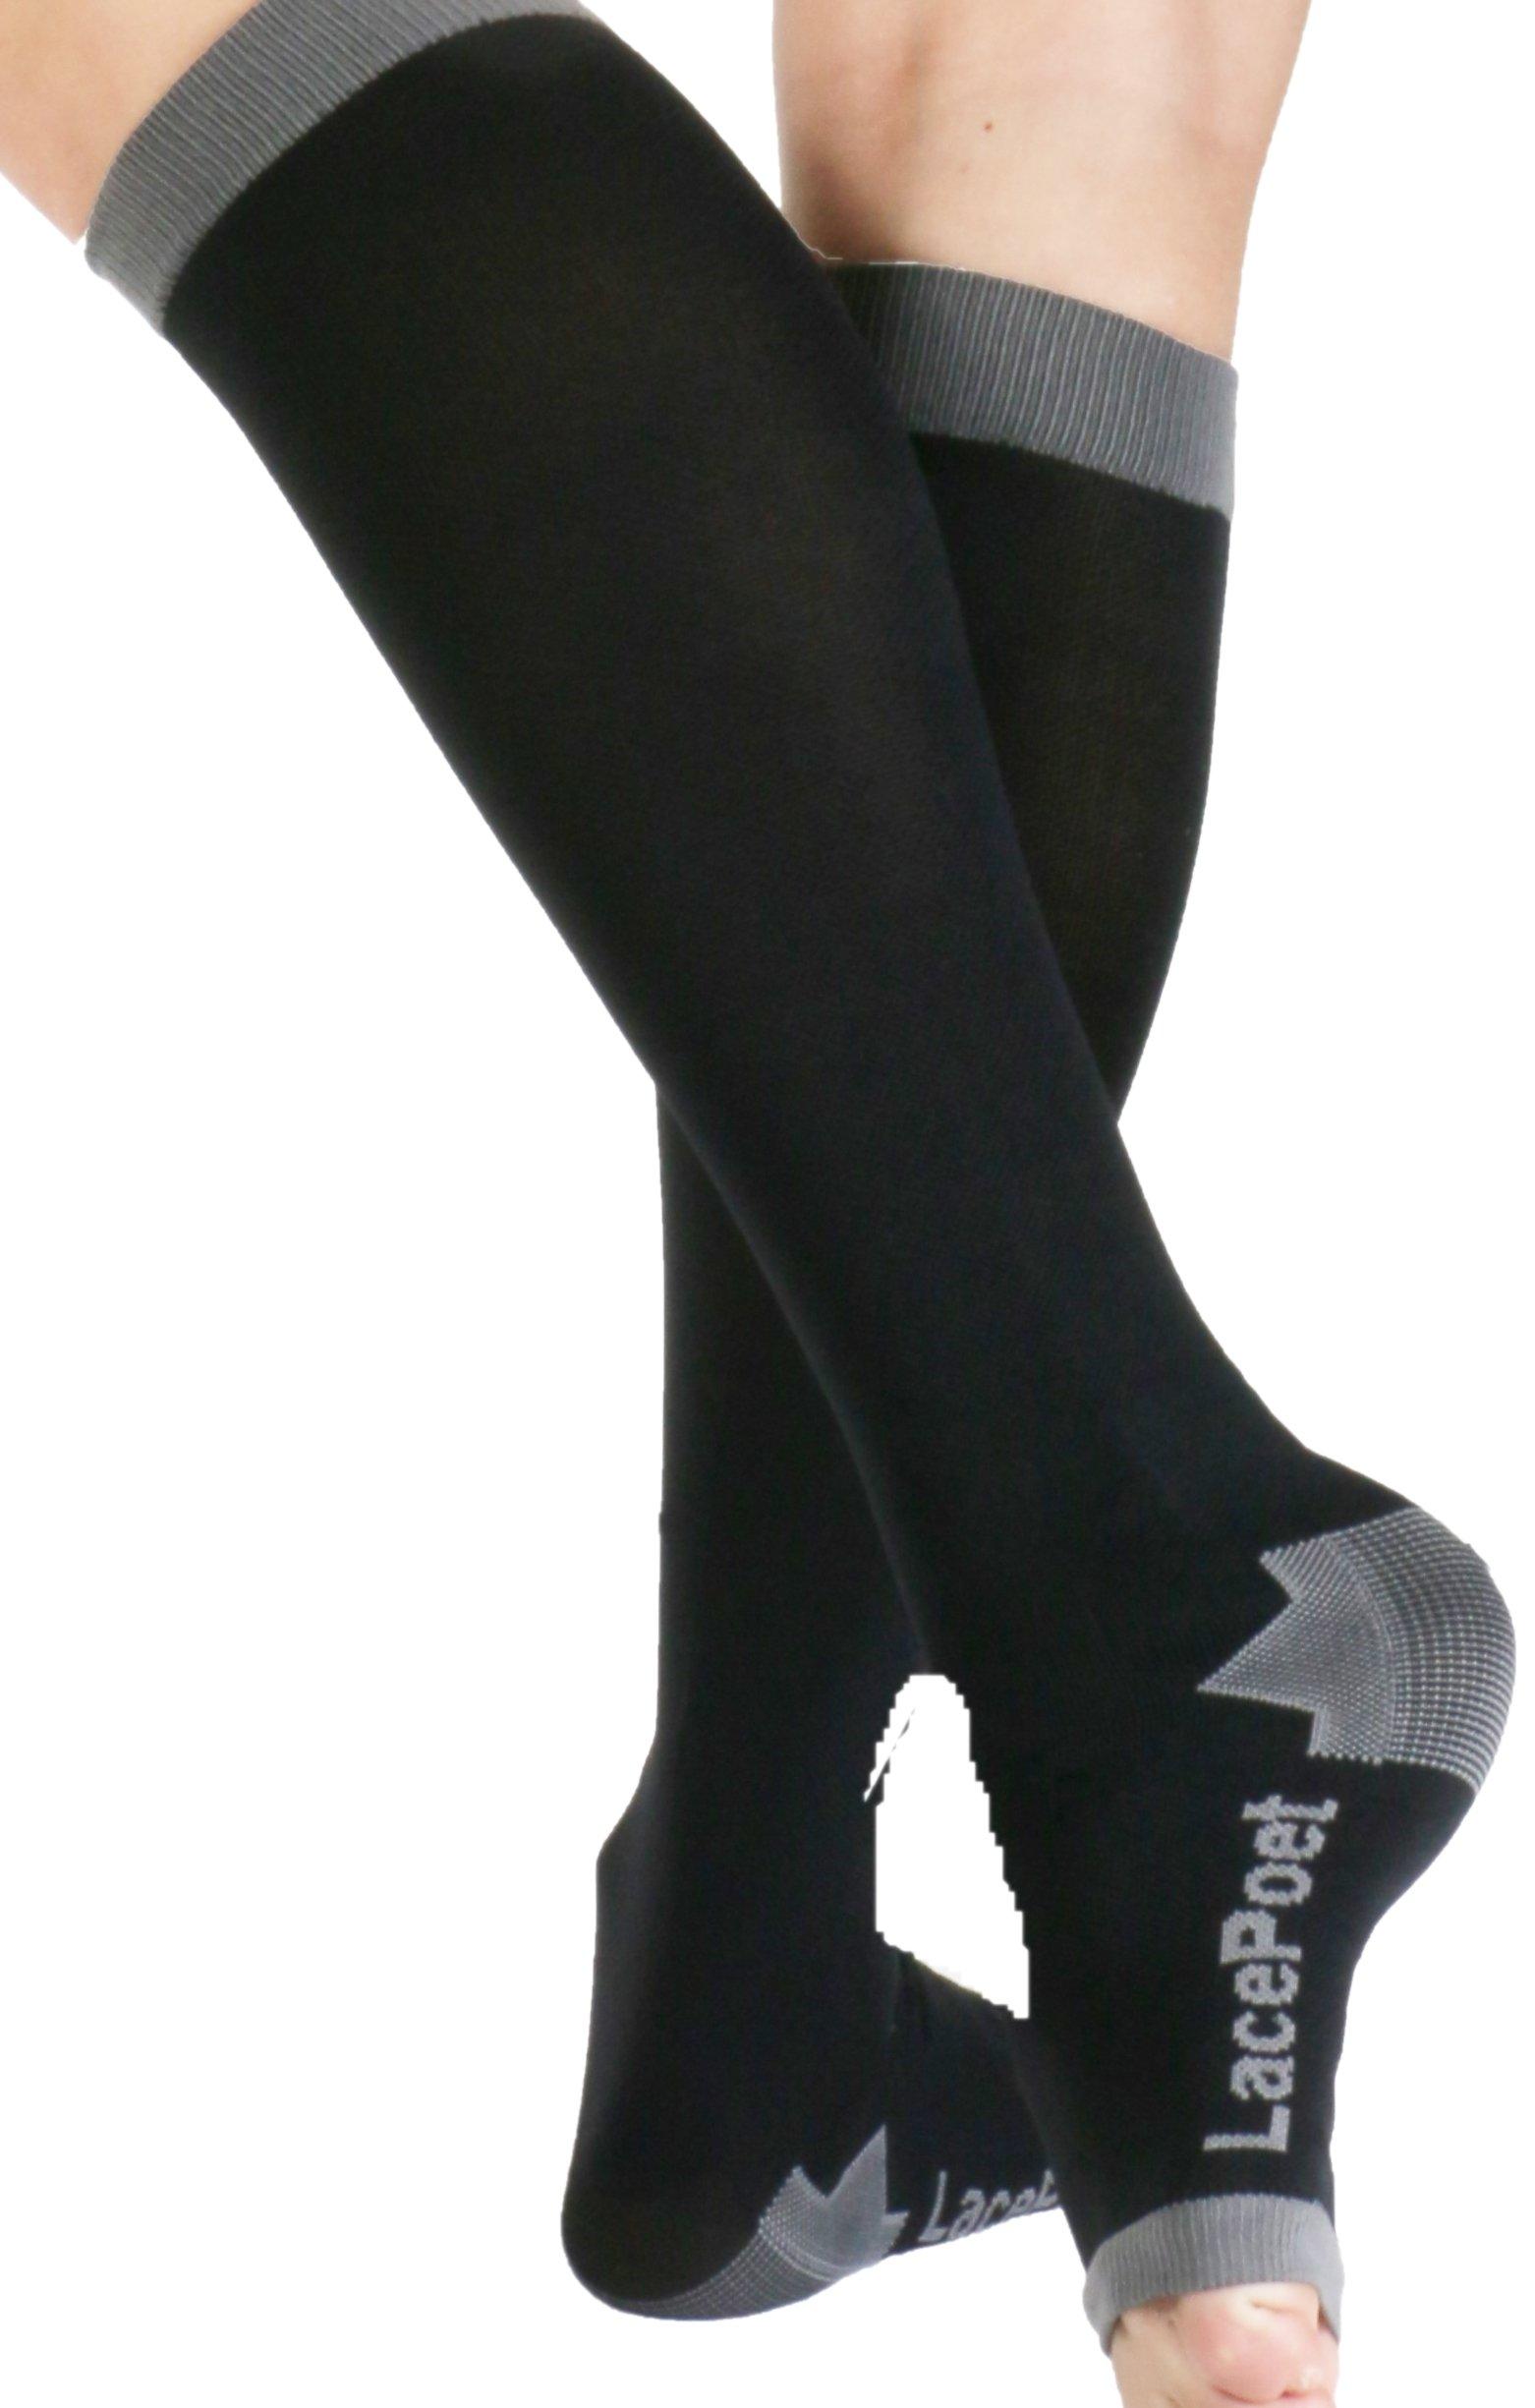 Lace Poet Knee-High Yoga/Sleep Compression Toeless Socks Black/Gray